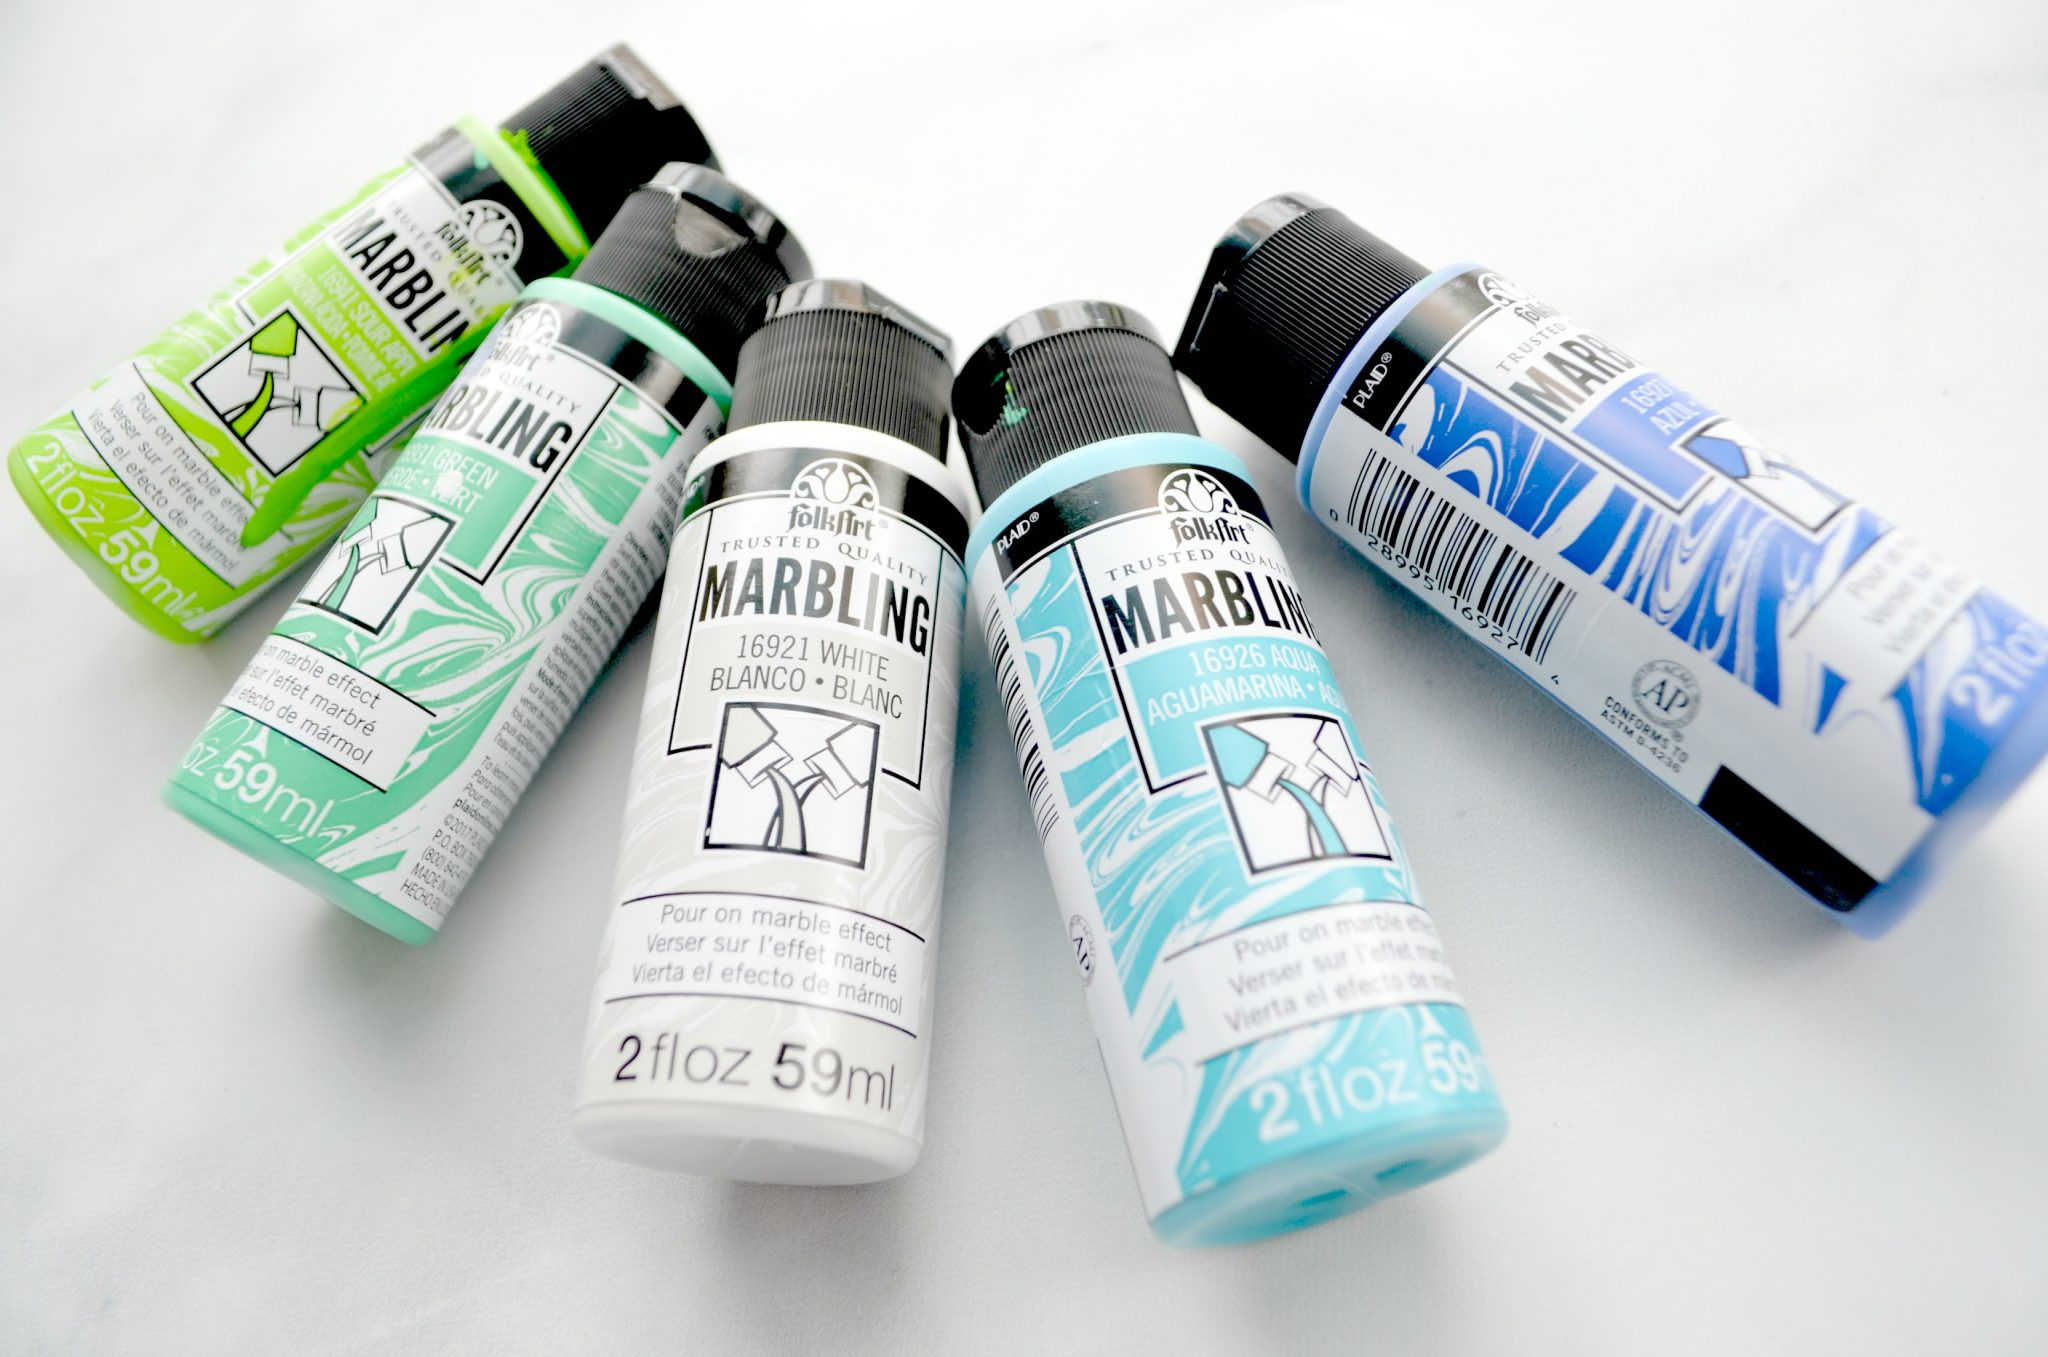 FolkArt Marbling Paints